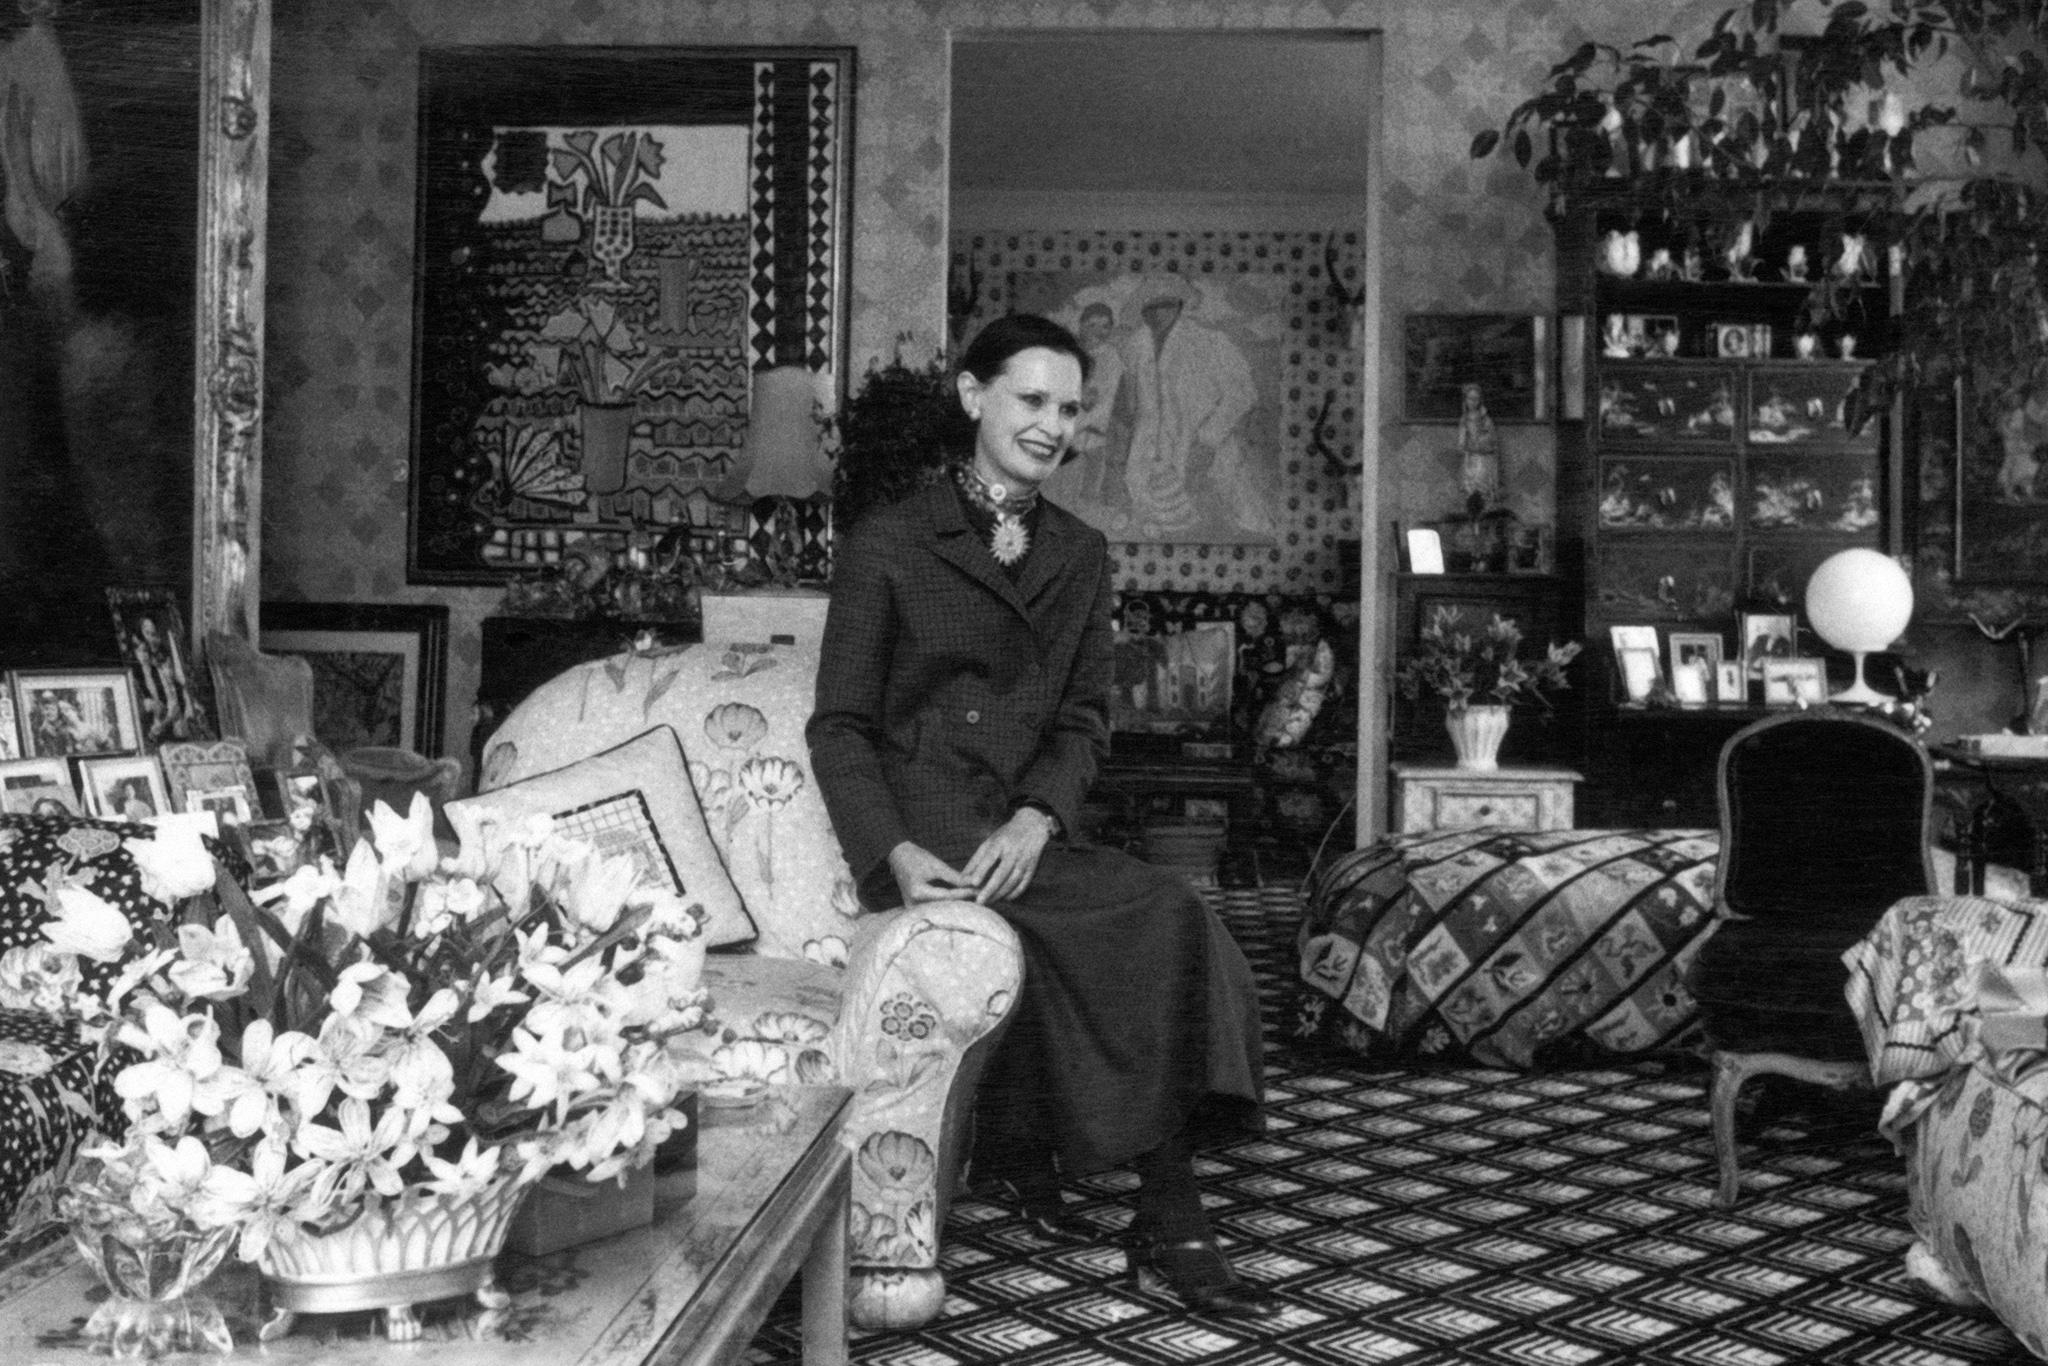 Portrait of socialite and heiress Gloria Vanderbilt at her home in New York in 1975.